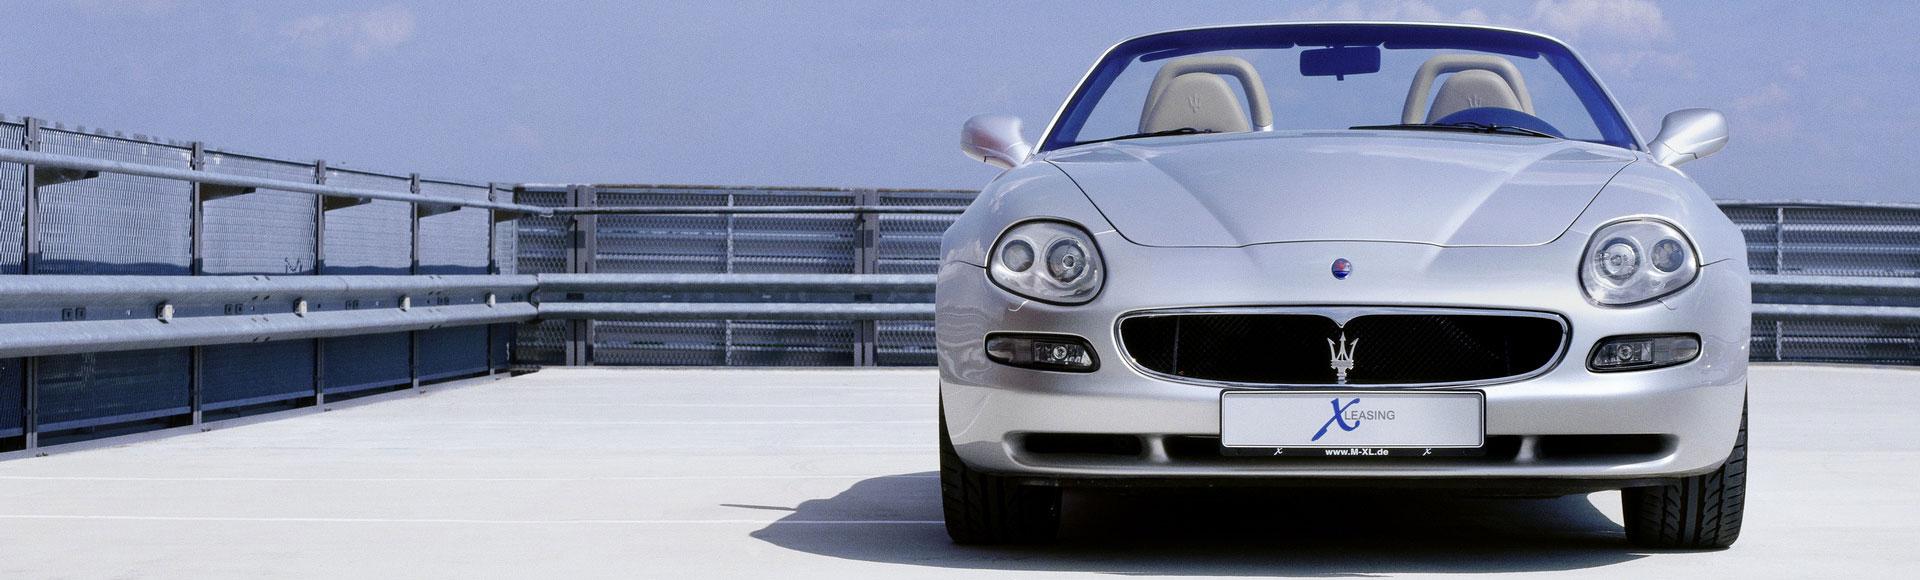 Maserati X Edition 2005 Sommer